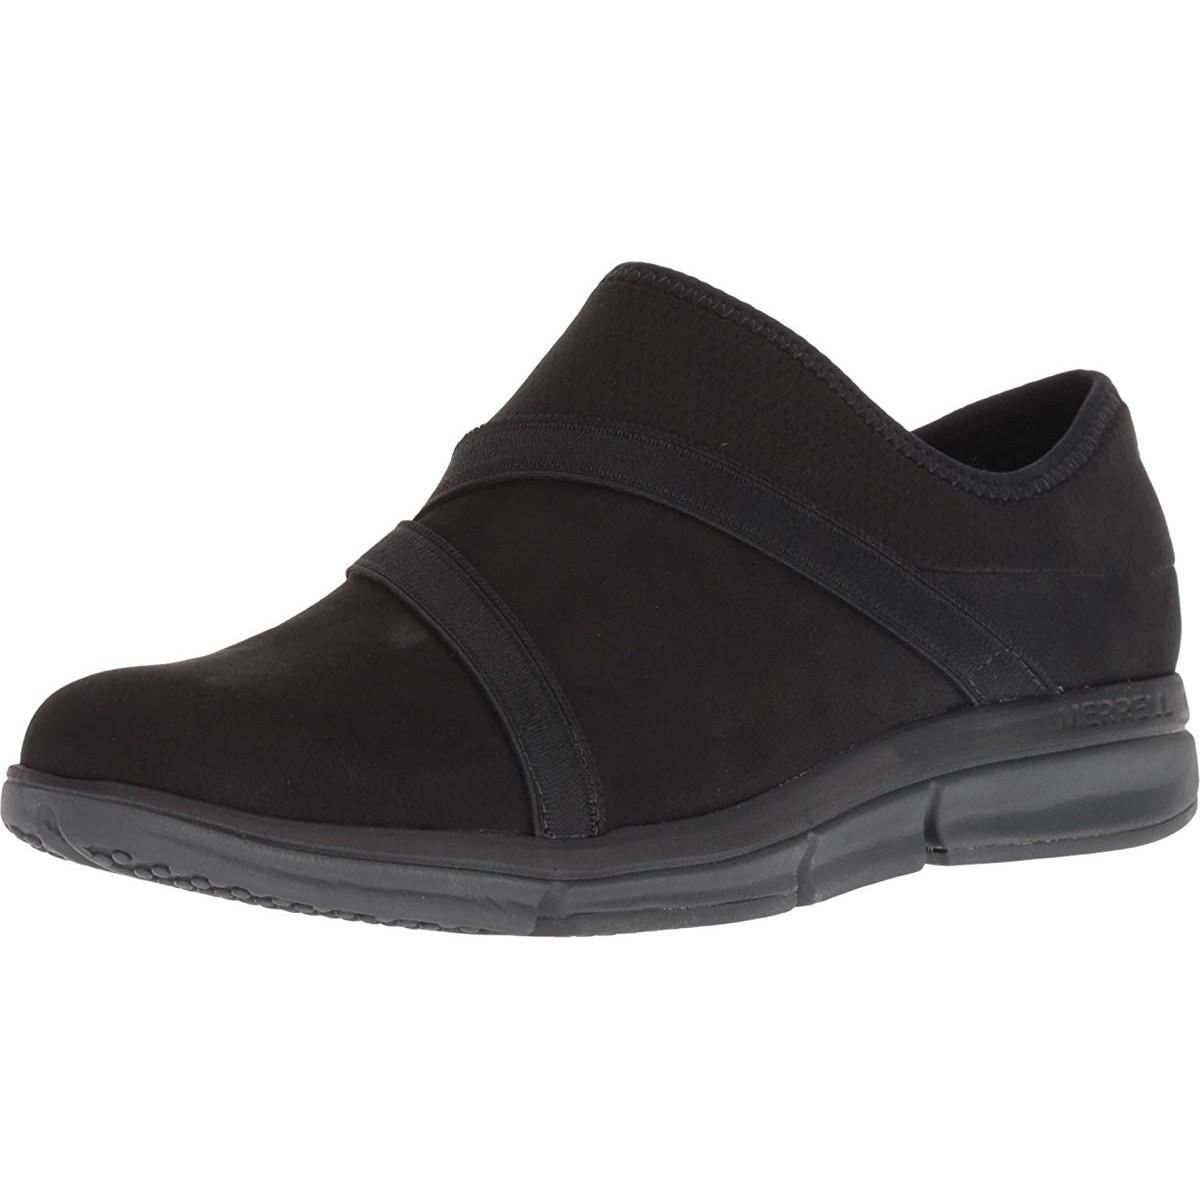 Кроссовки Merrell Zoe Sojourn Leather Q2 Black - Оригинал, фото 1